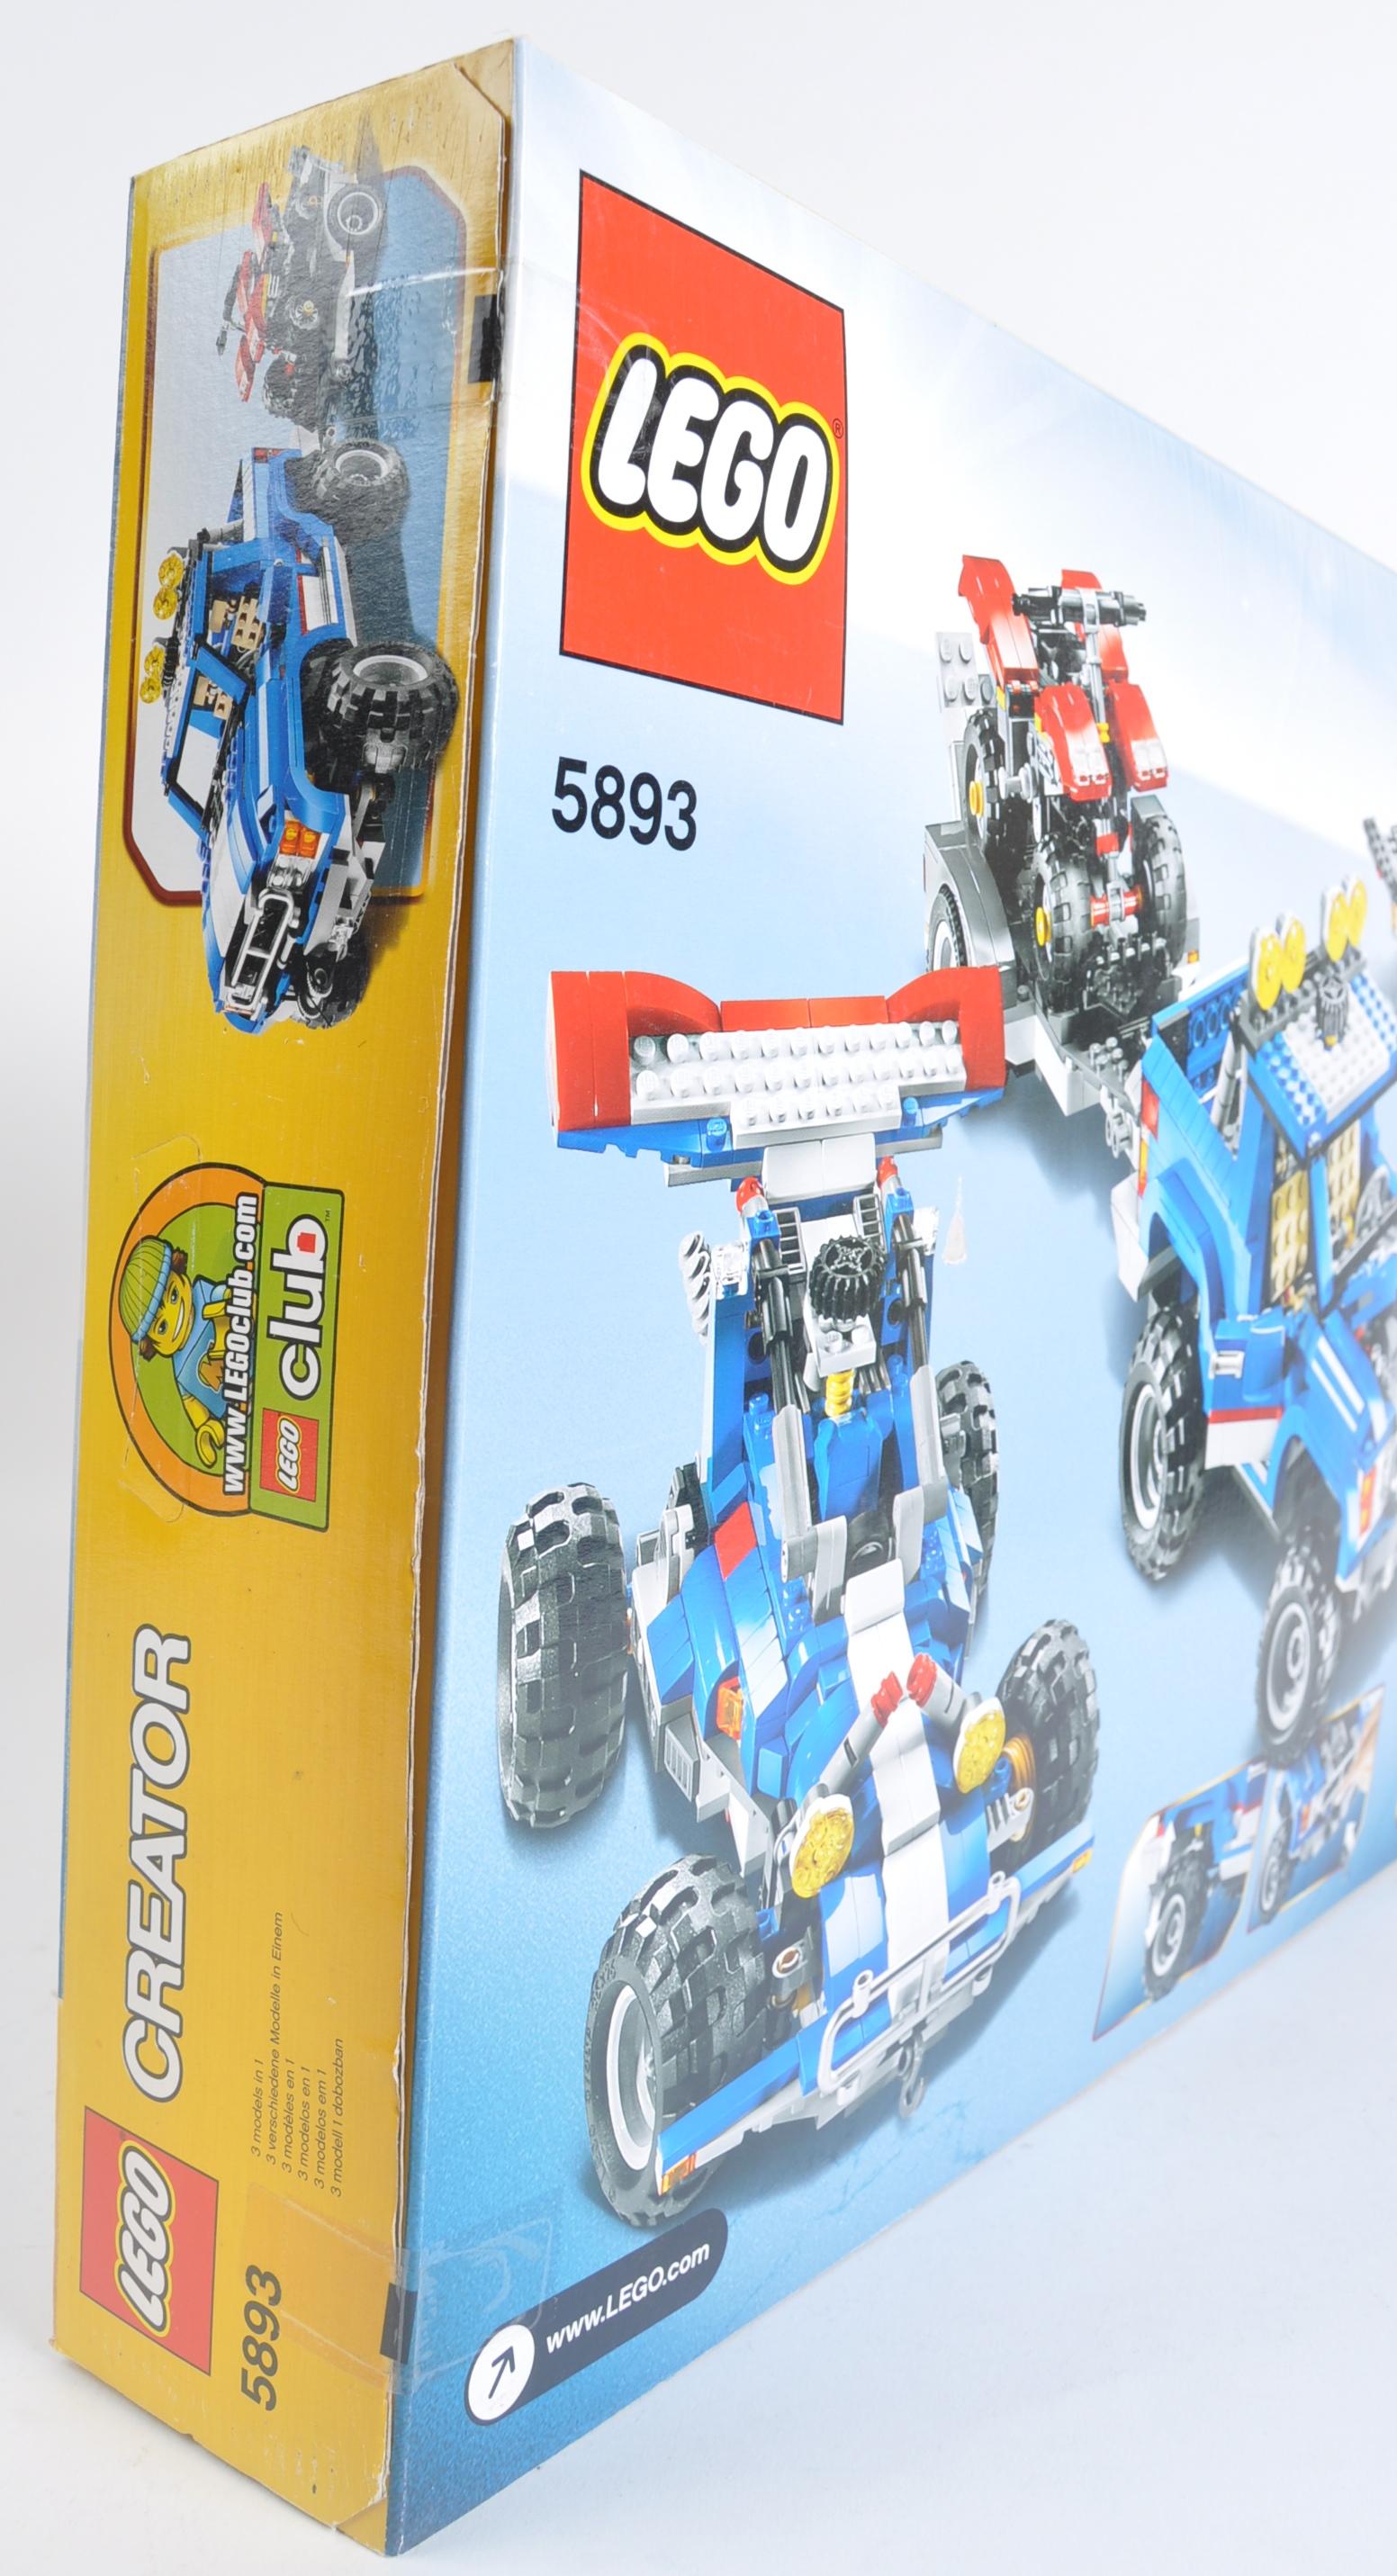 LEGO SET - LEGO CREATOR - 5893 - OFF ROAD POWER - Image 4 of 4